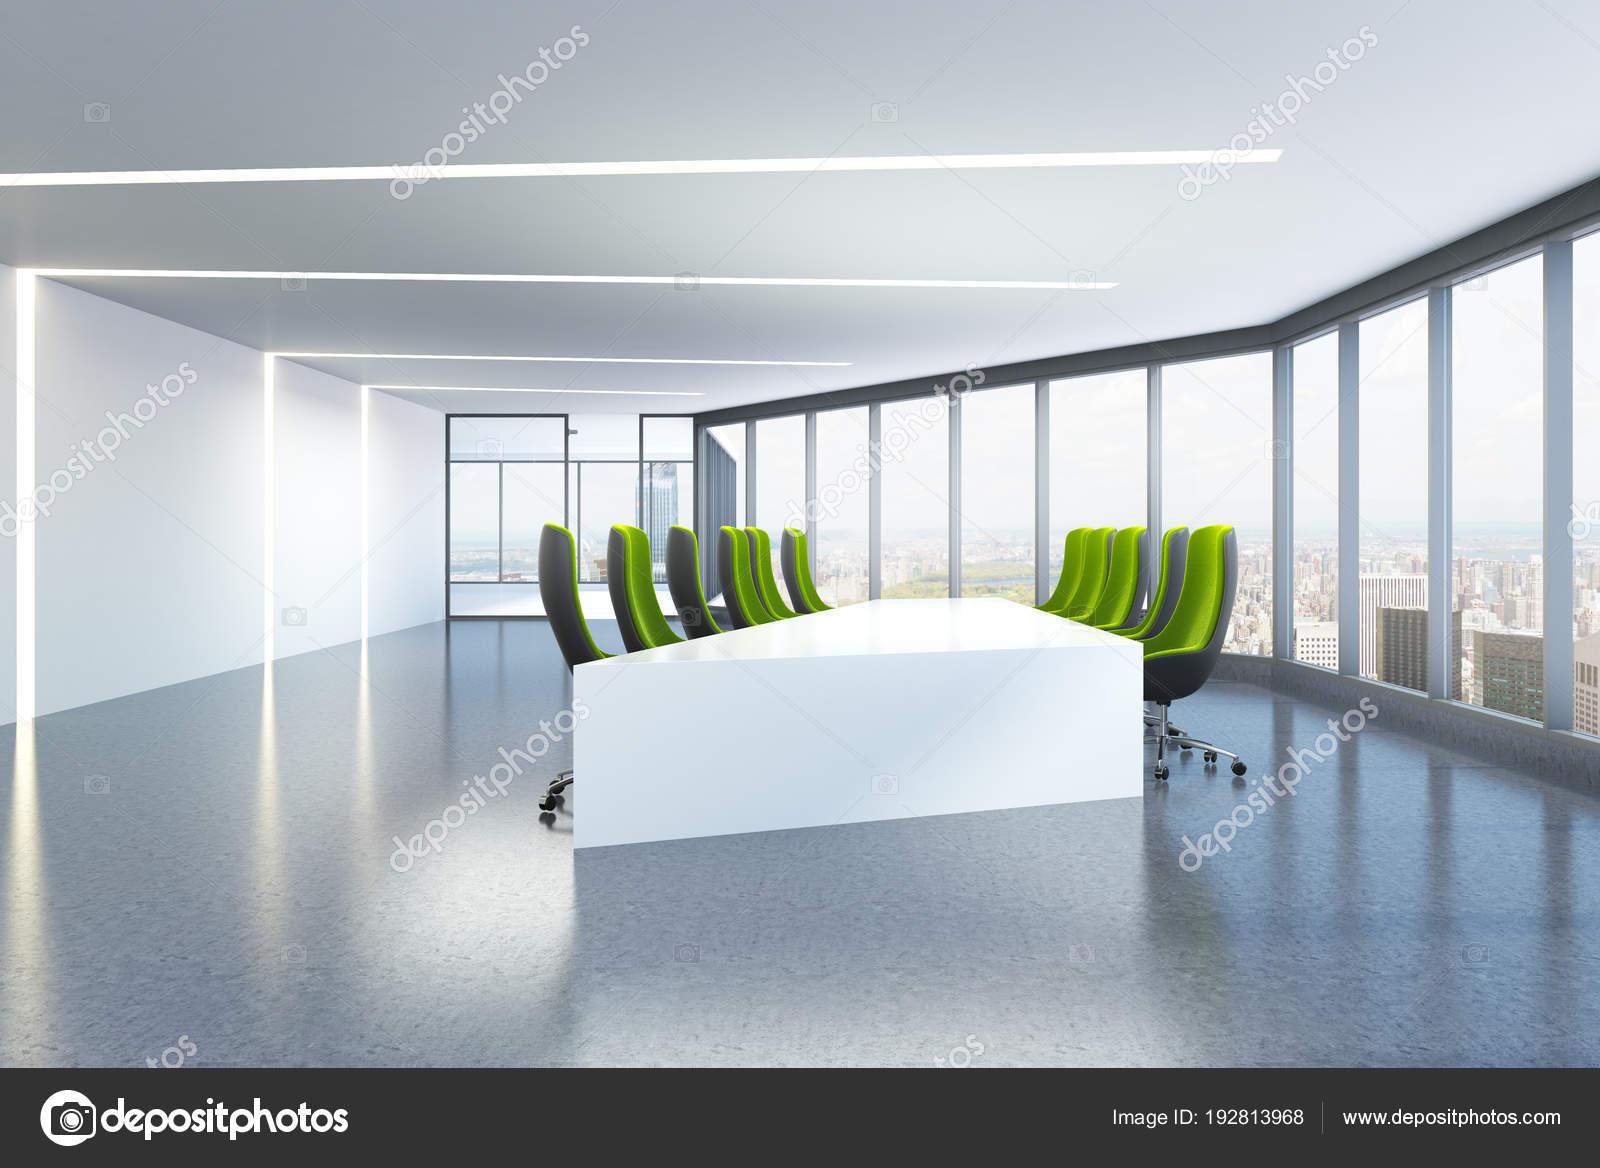 Sala riunioni panoramica sedie verdi triangolare u foto stock